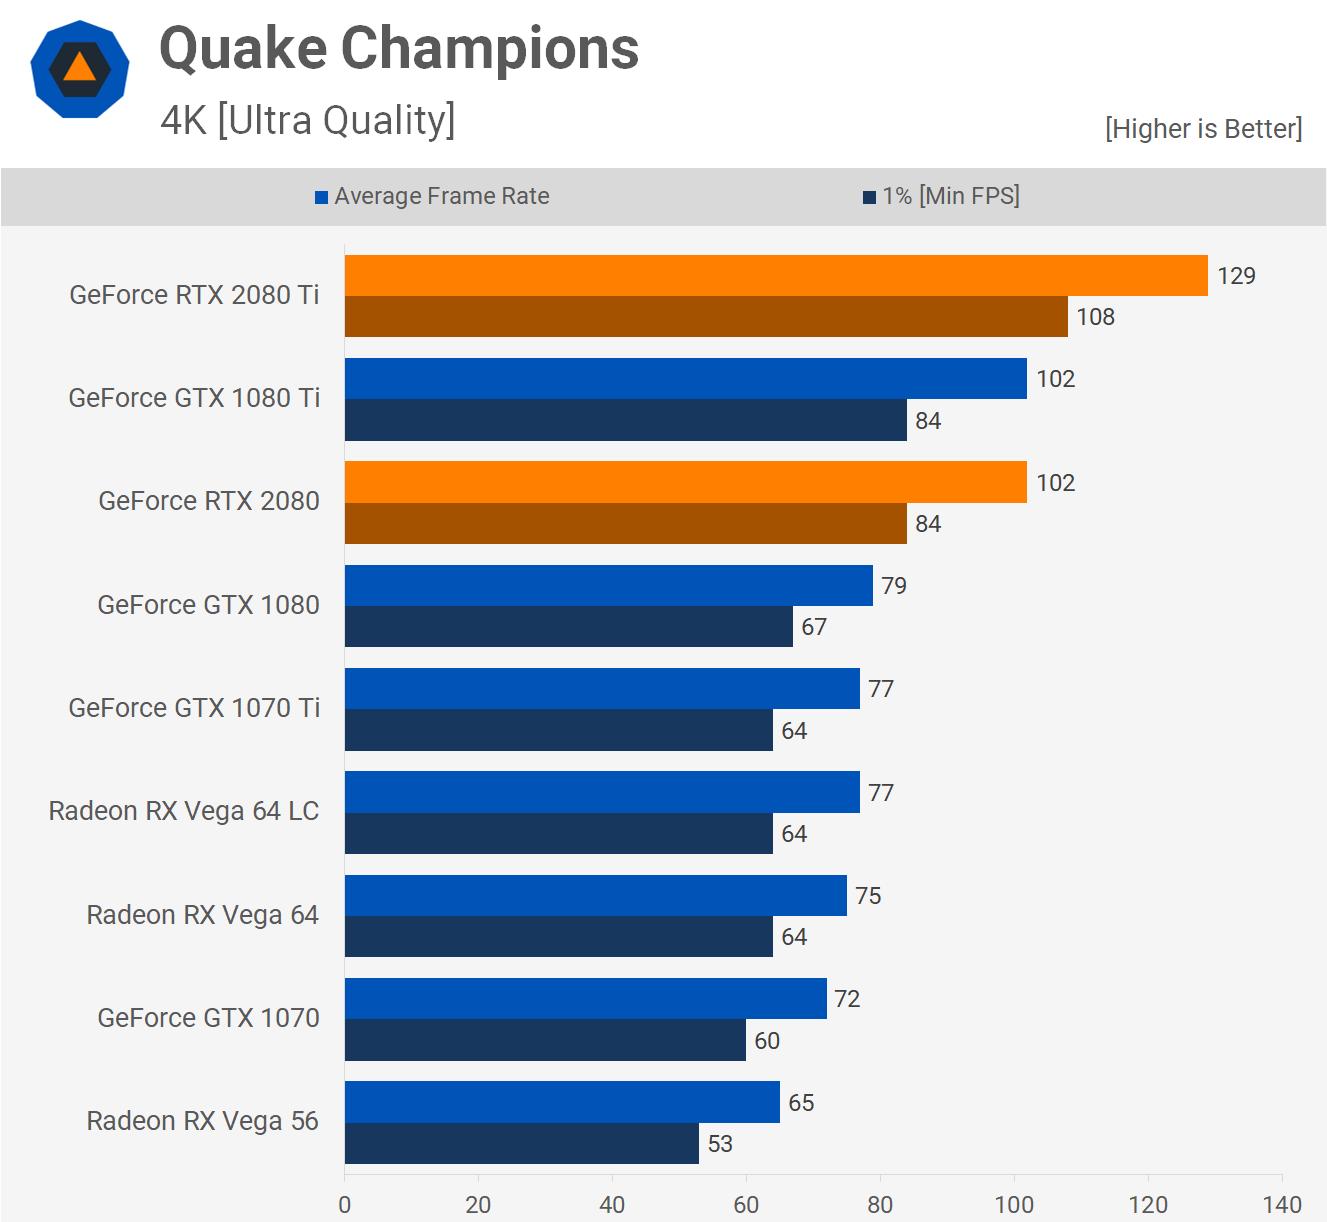 Quake Champions